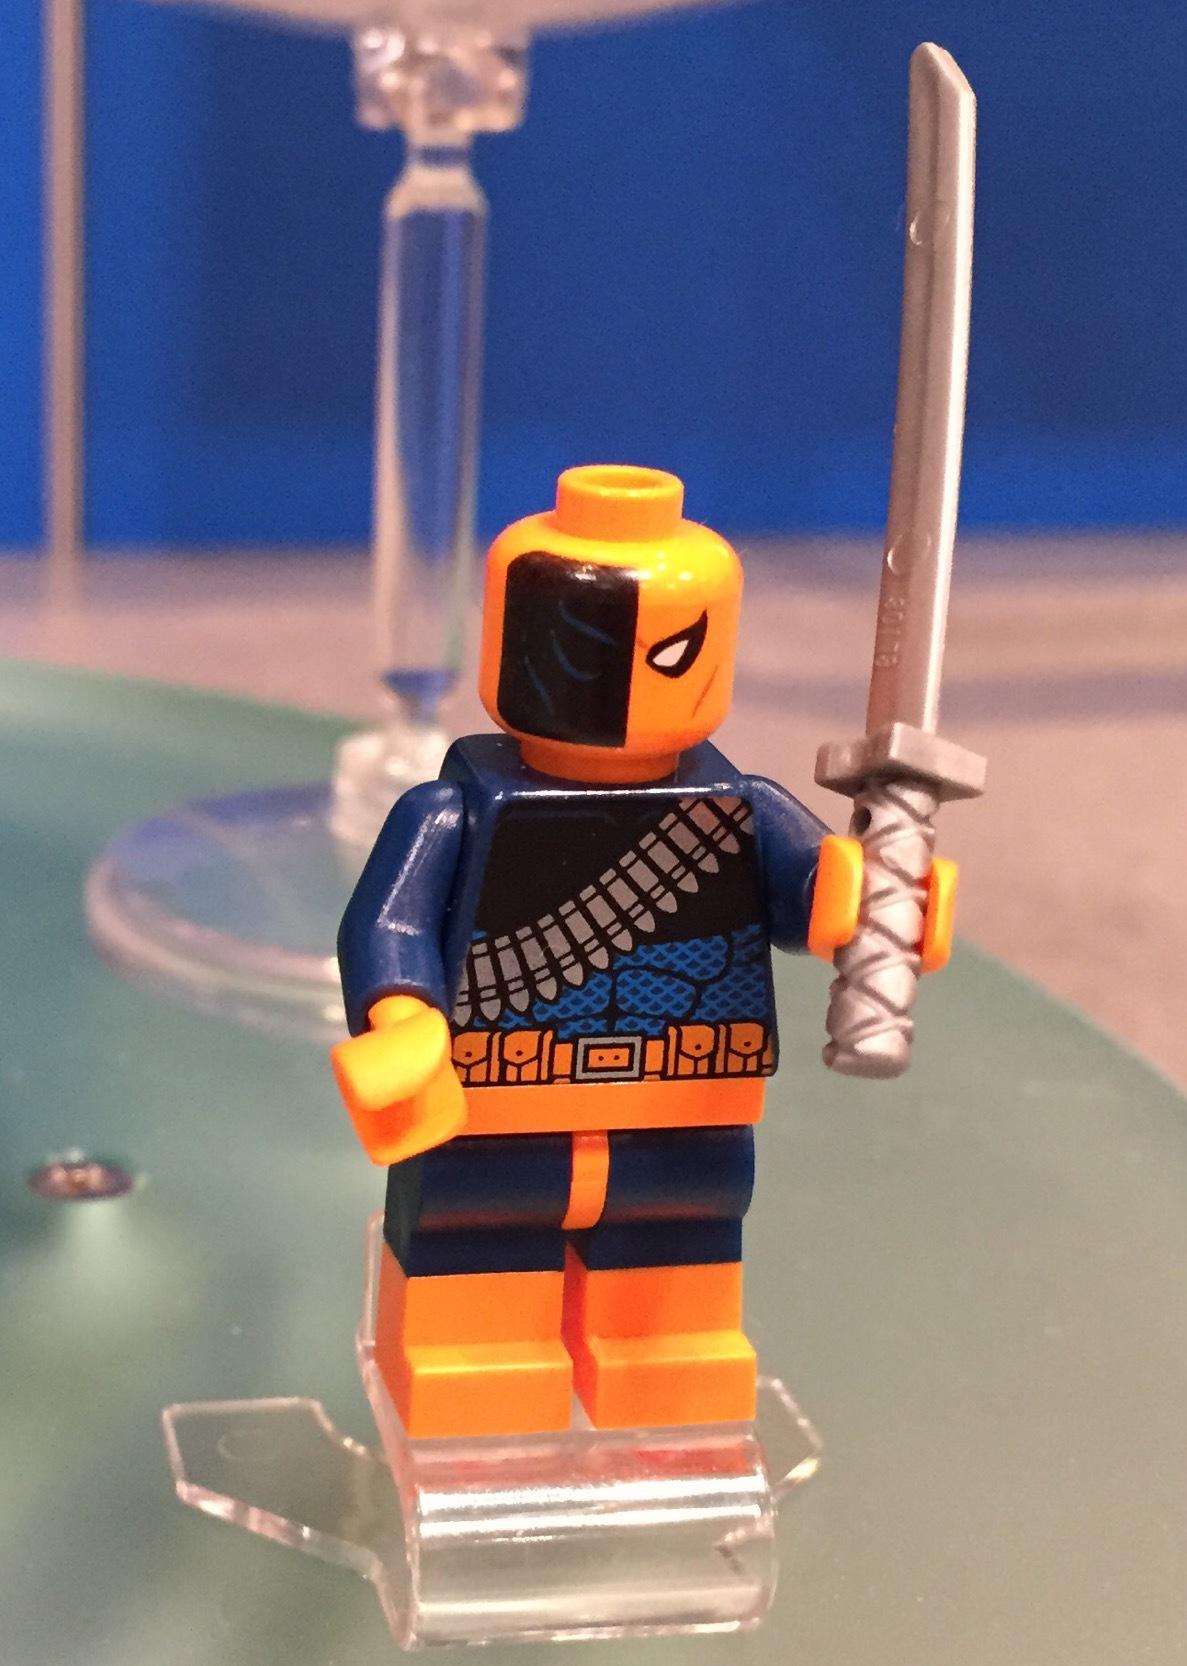 deathstroke lego-#36